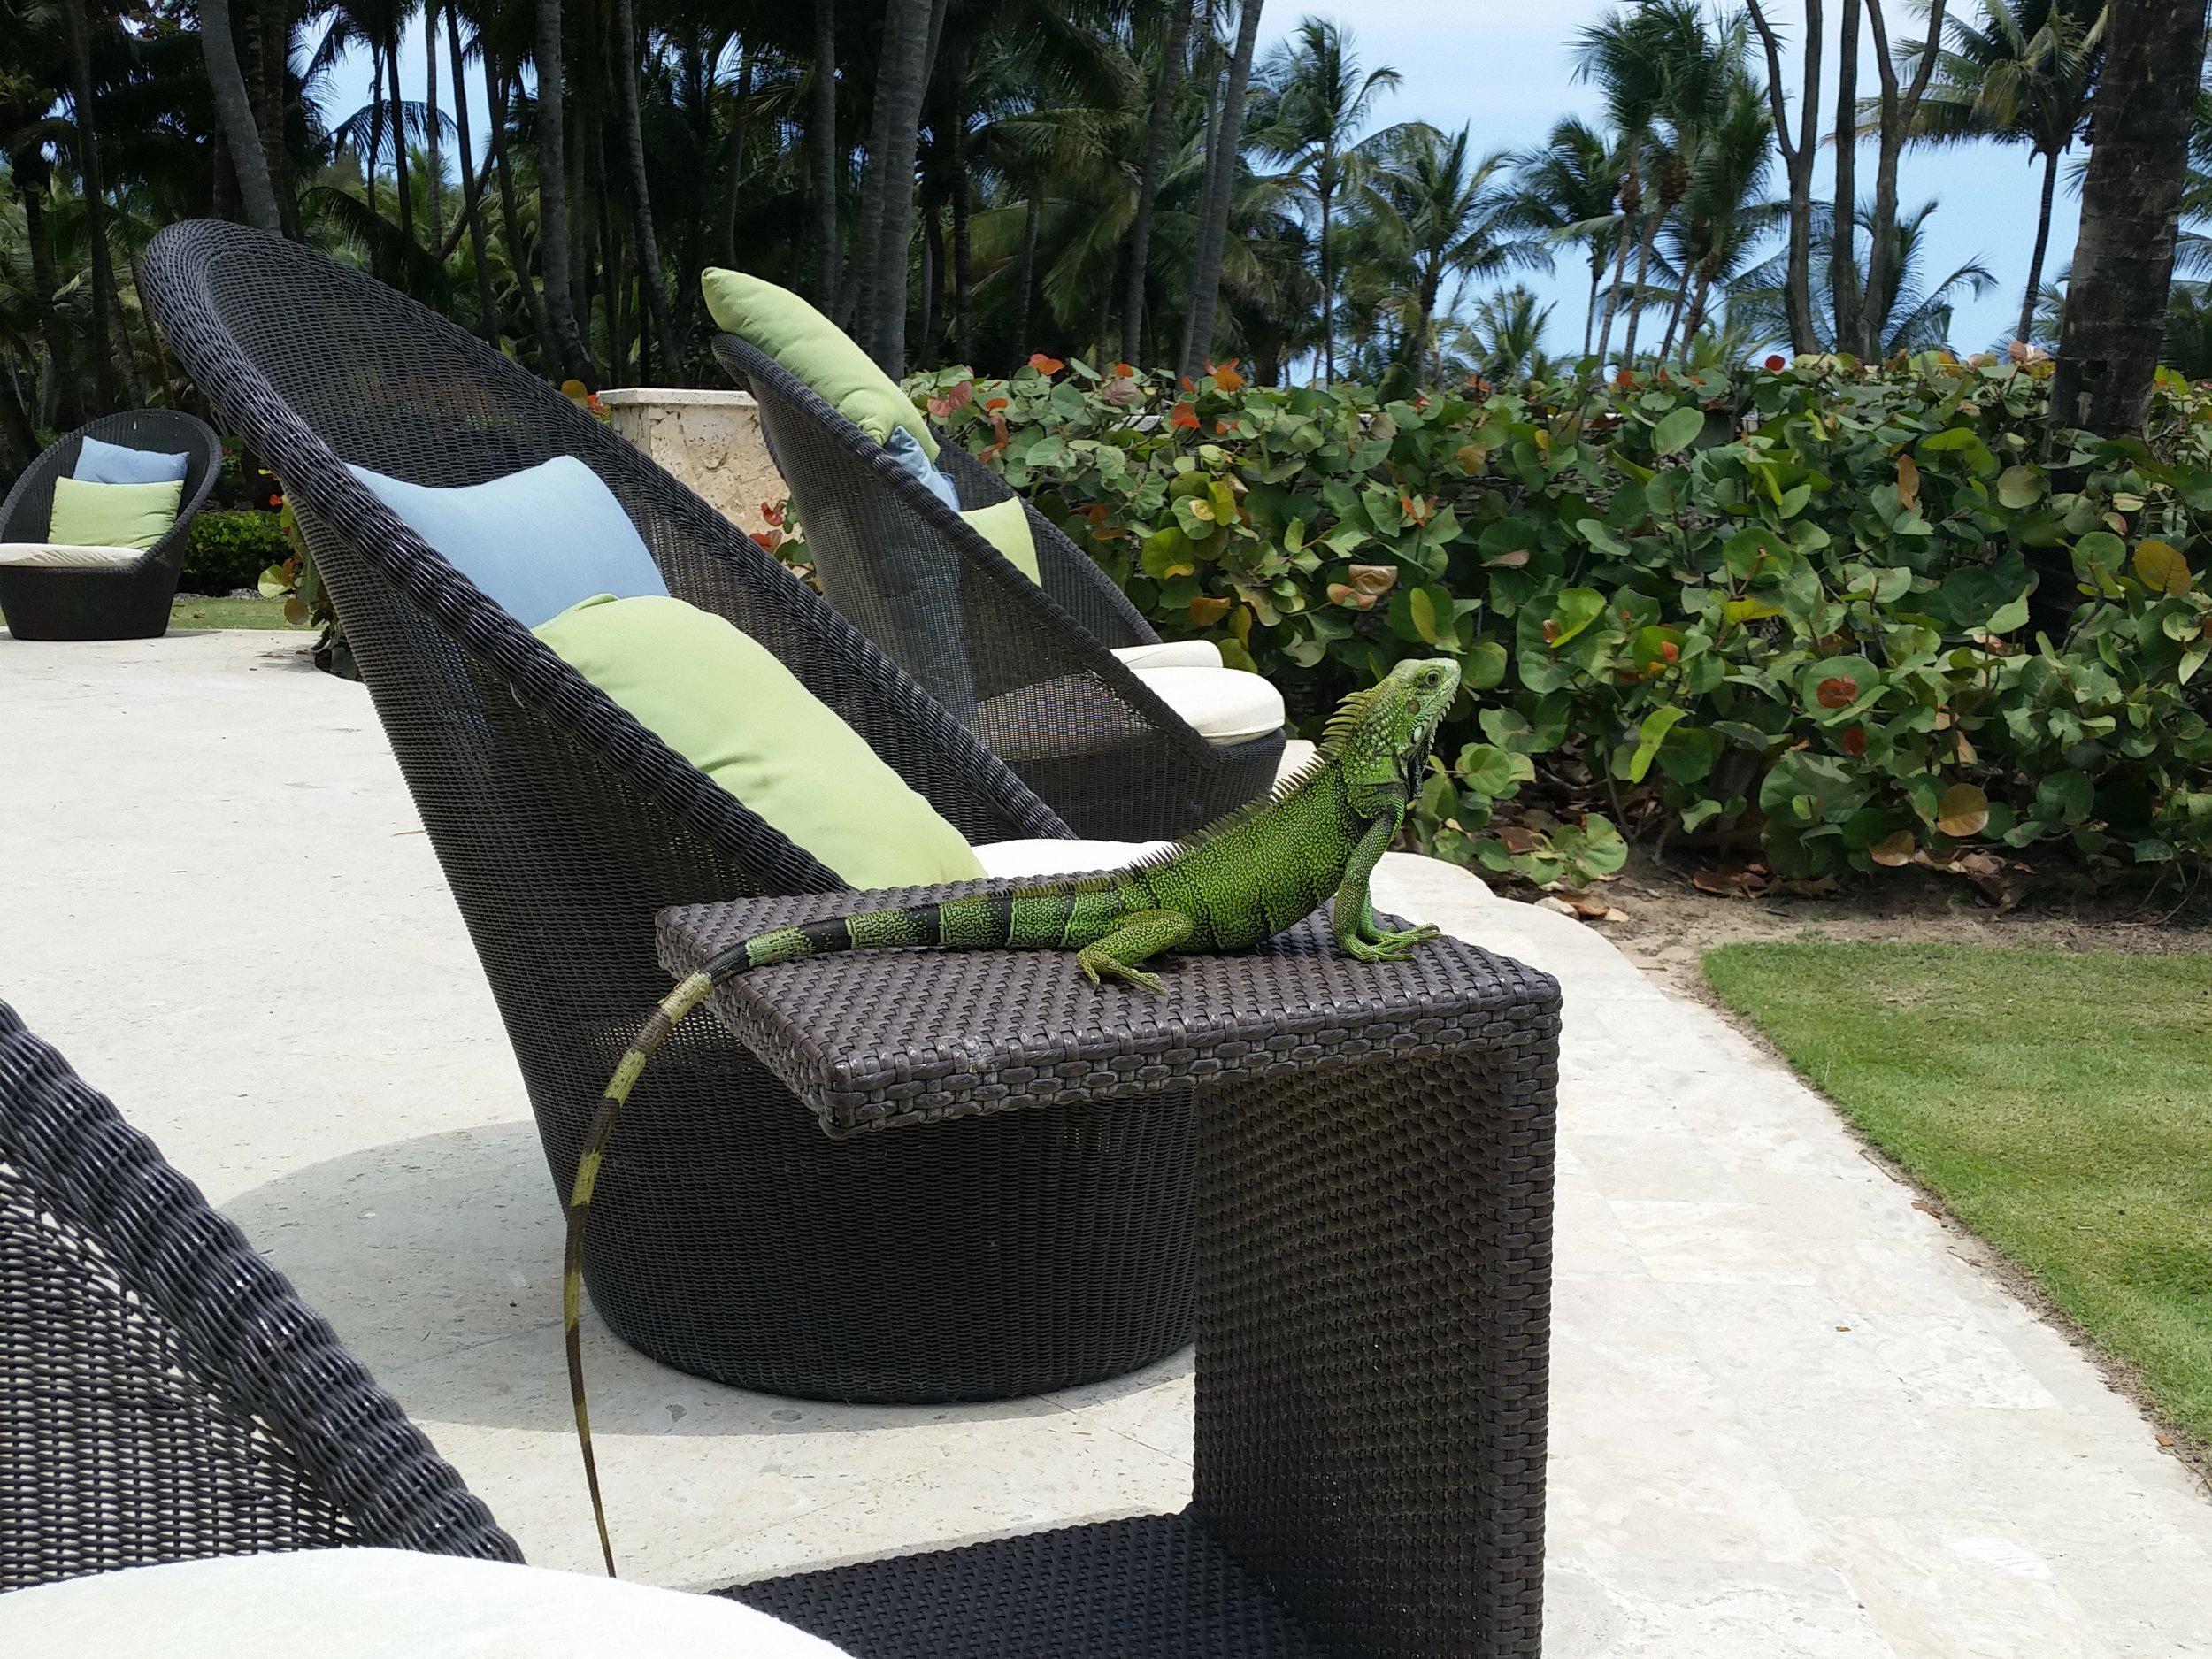 Iguana - Bahia Beach, PR